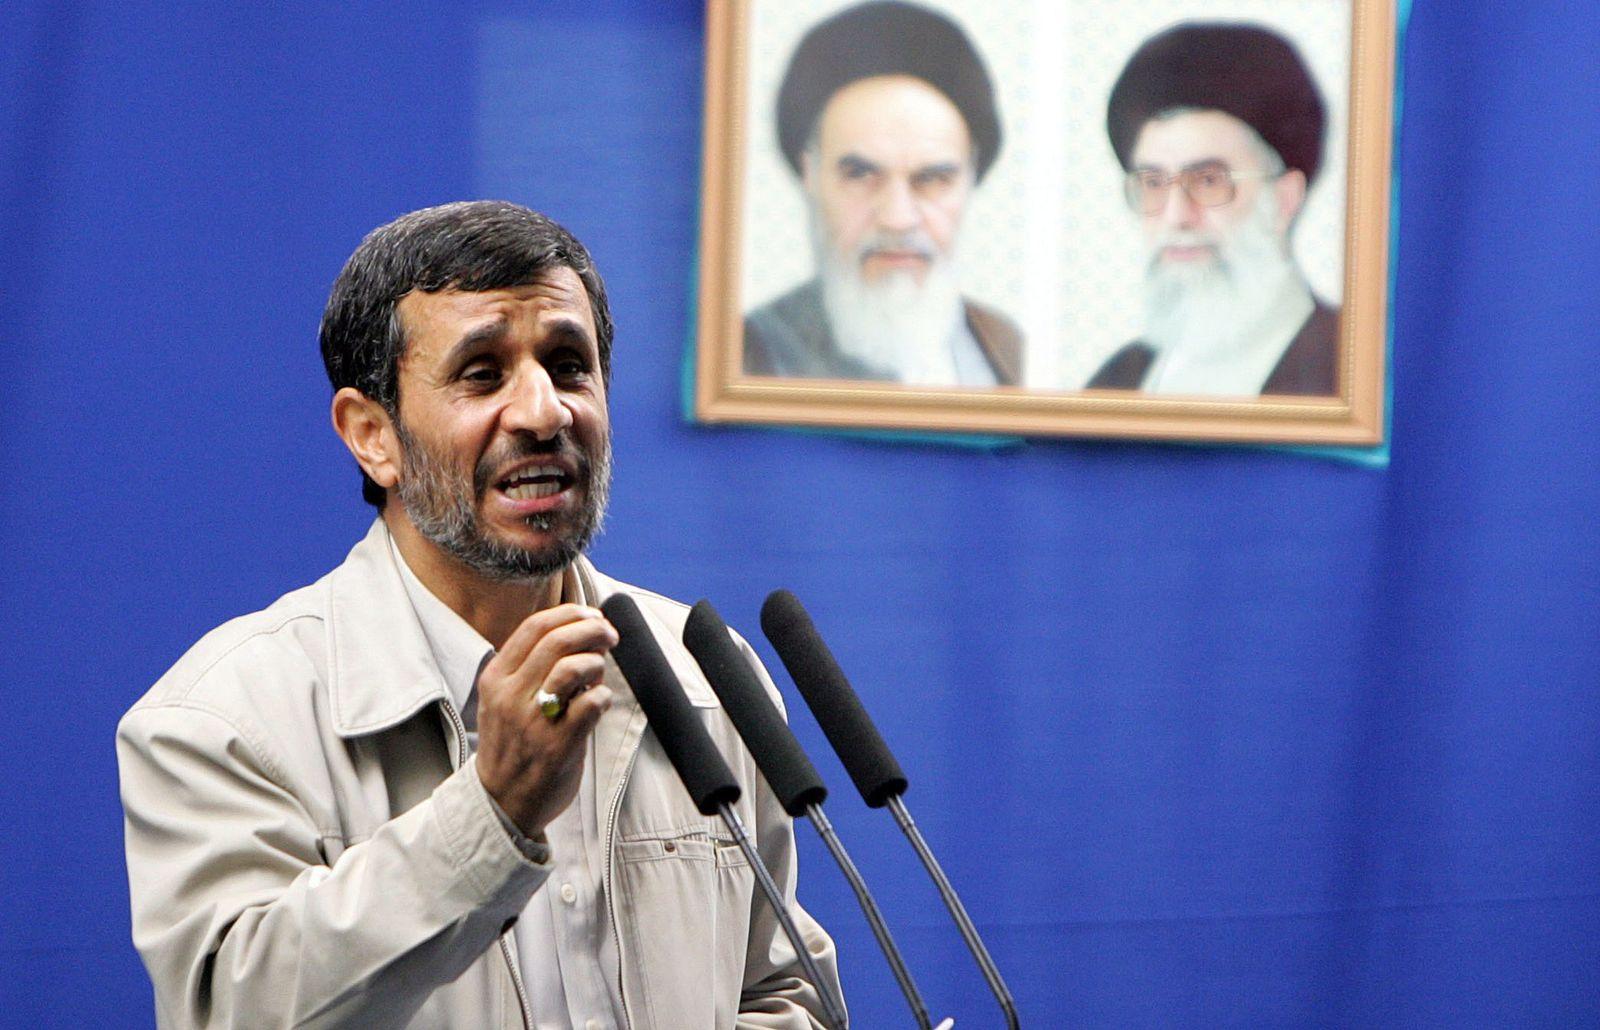 Ahmadinedschad am pult